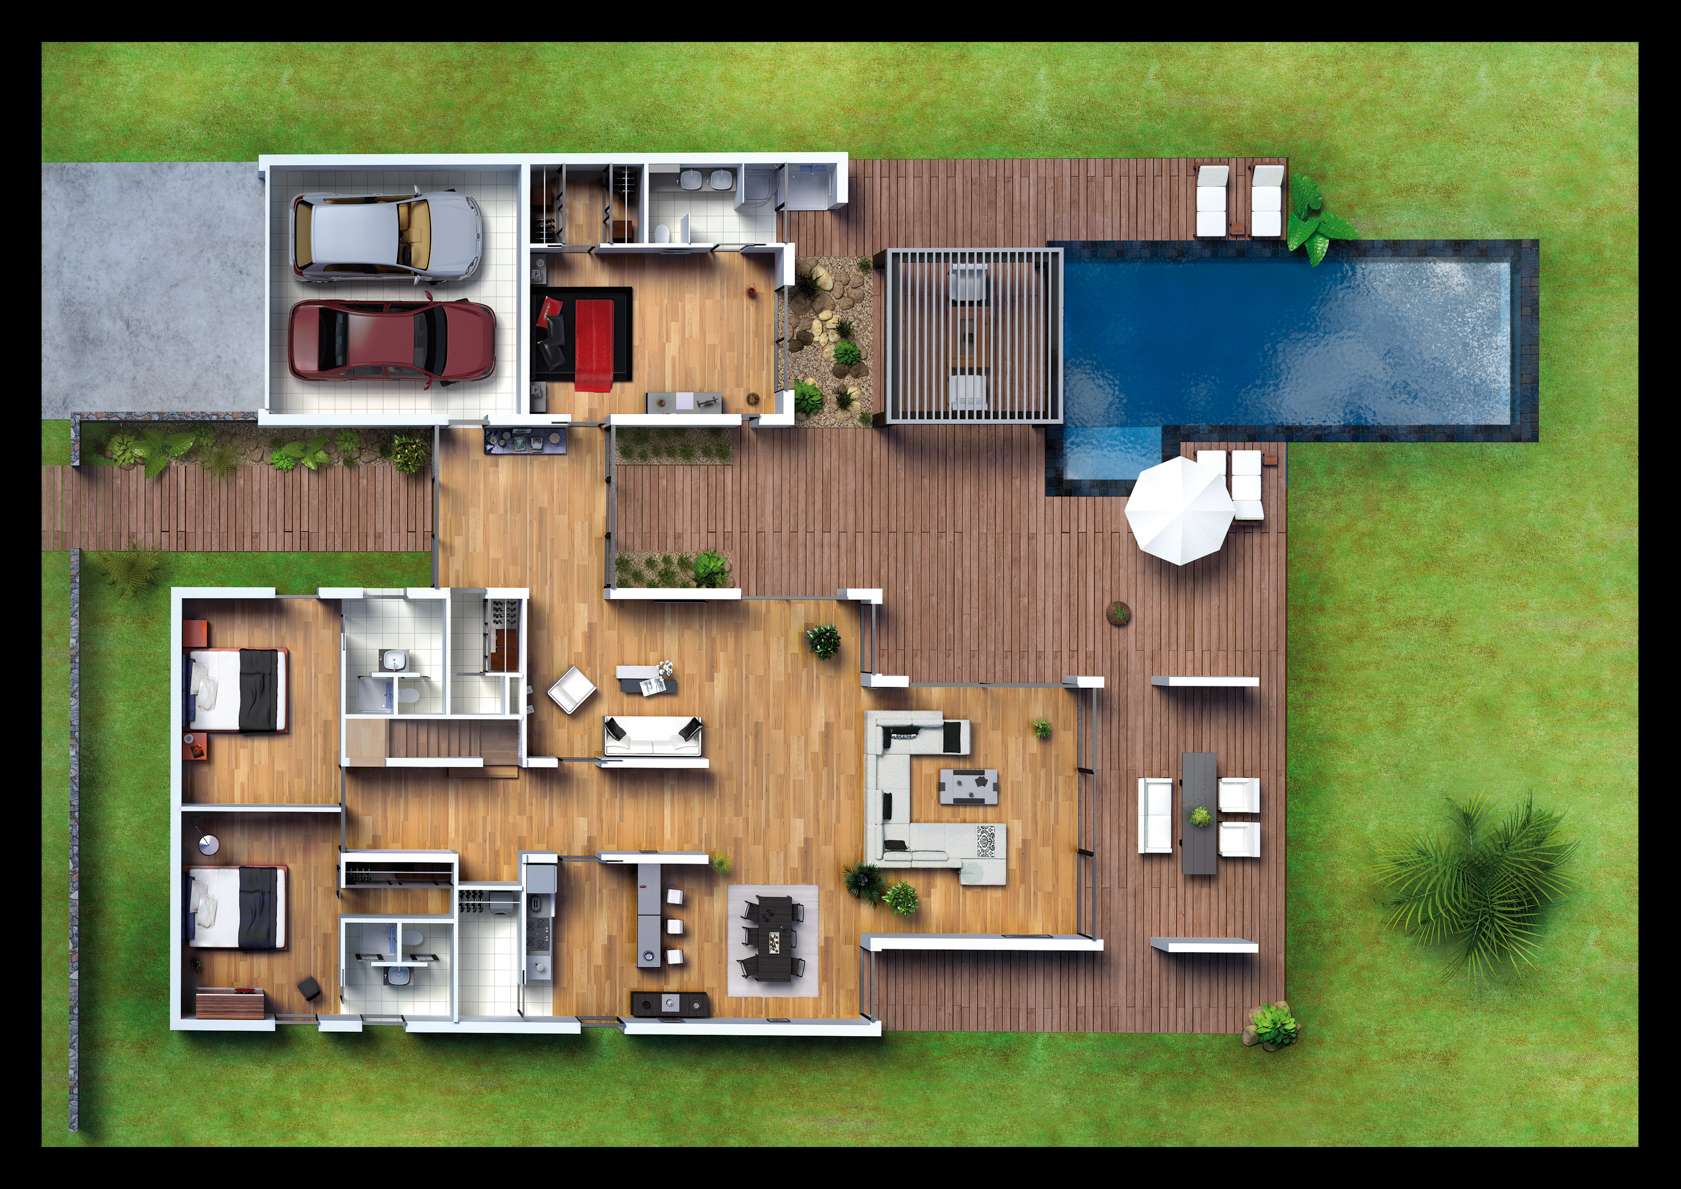 Plan de Masse 3D aménagement maison par Dripmoon